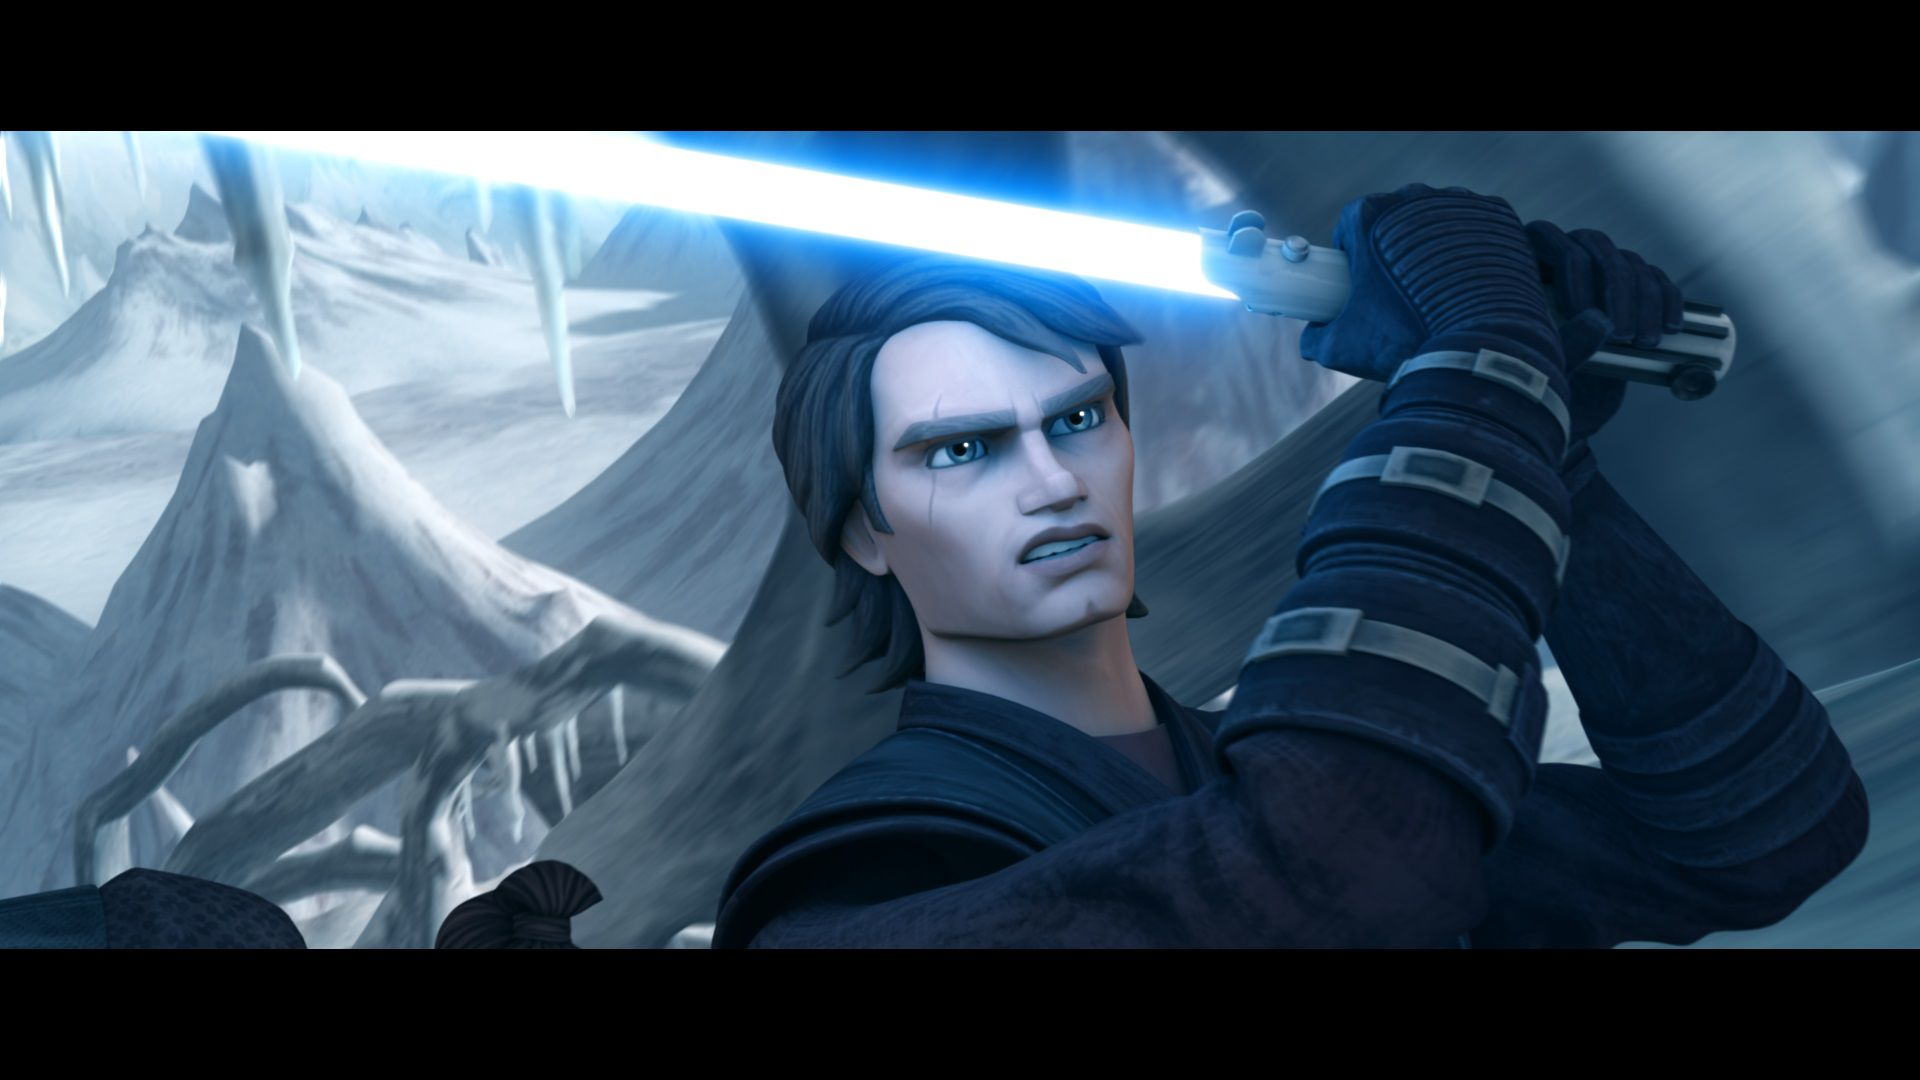 Anakin Skywalker in 'Star Wars: The Clone Wars'